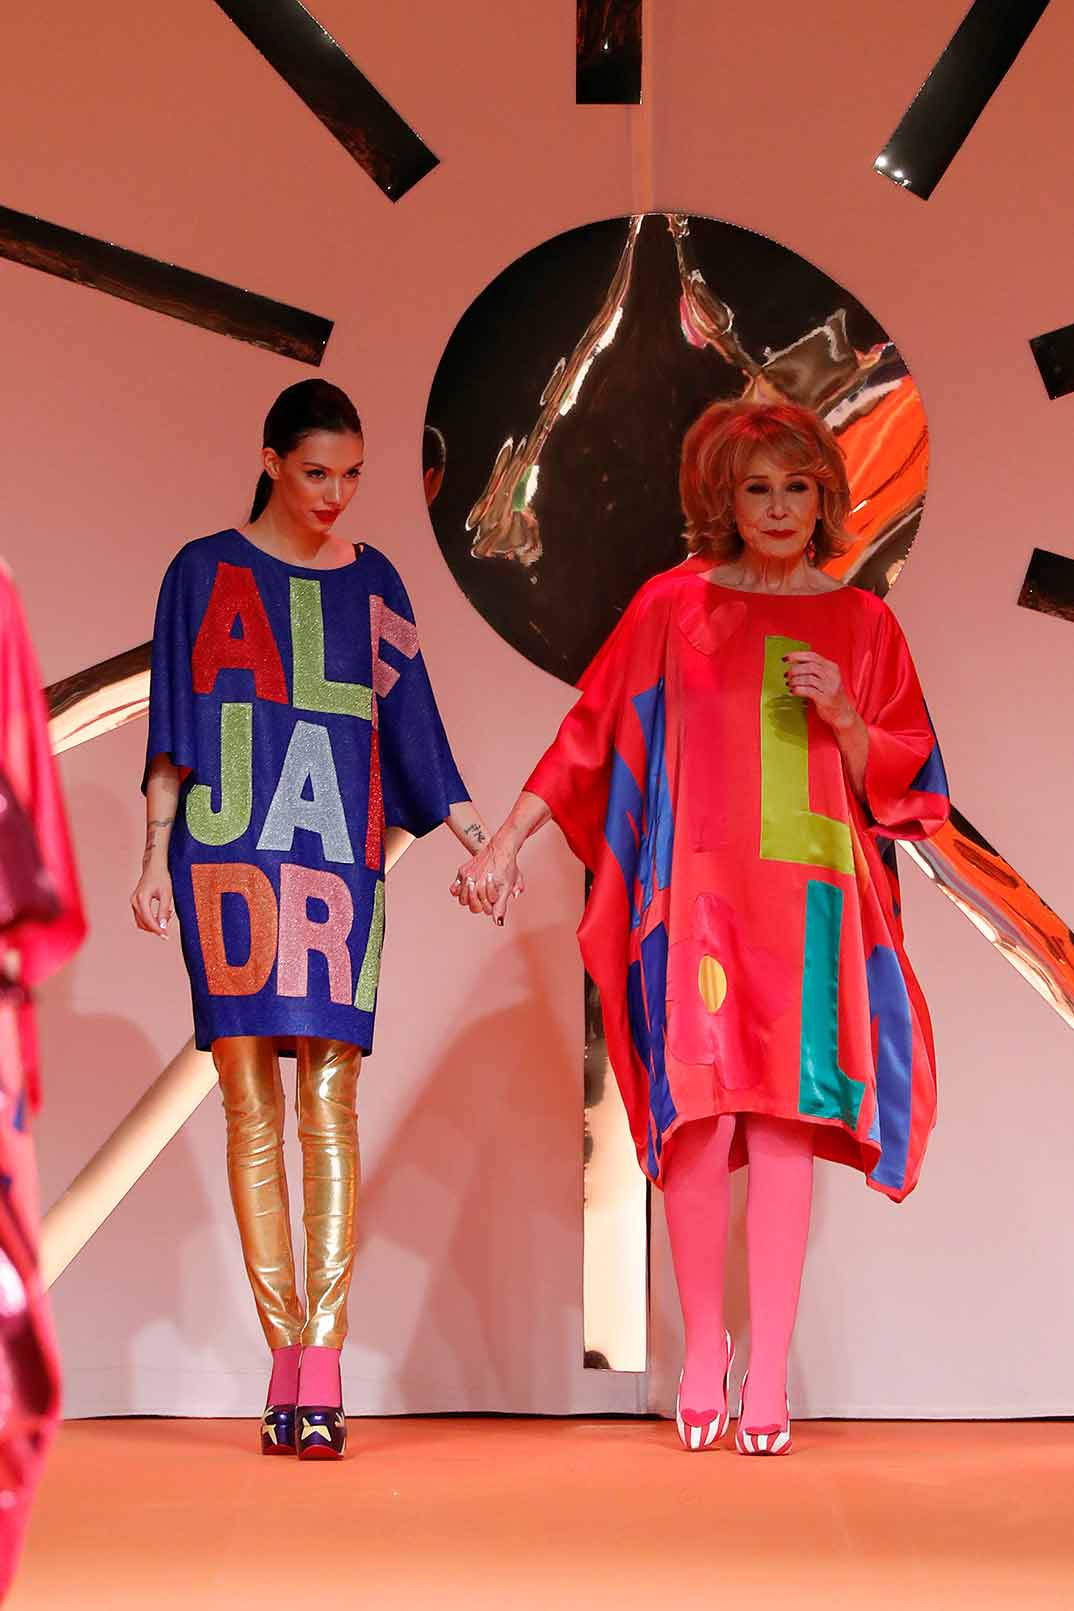 Alejandra Rubio y Mila Ximénez - Agatha Ruiz de la Prada - Fashion Week Madrid Otoño-Invierno 2020-2021